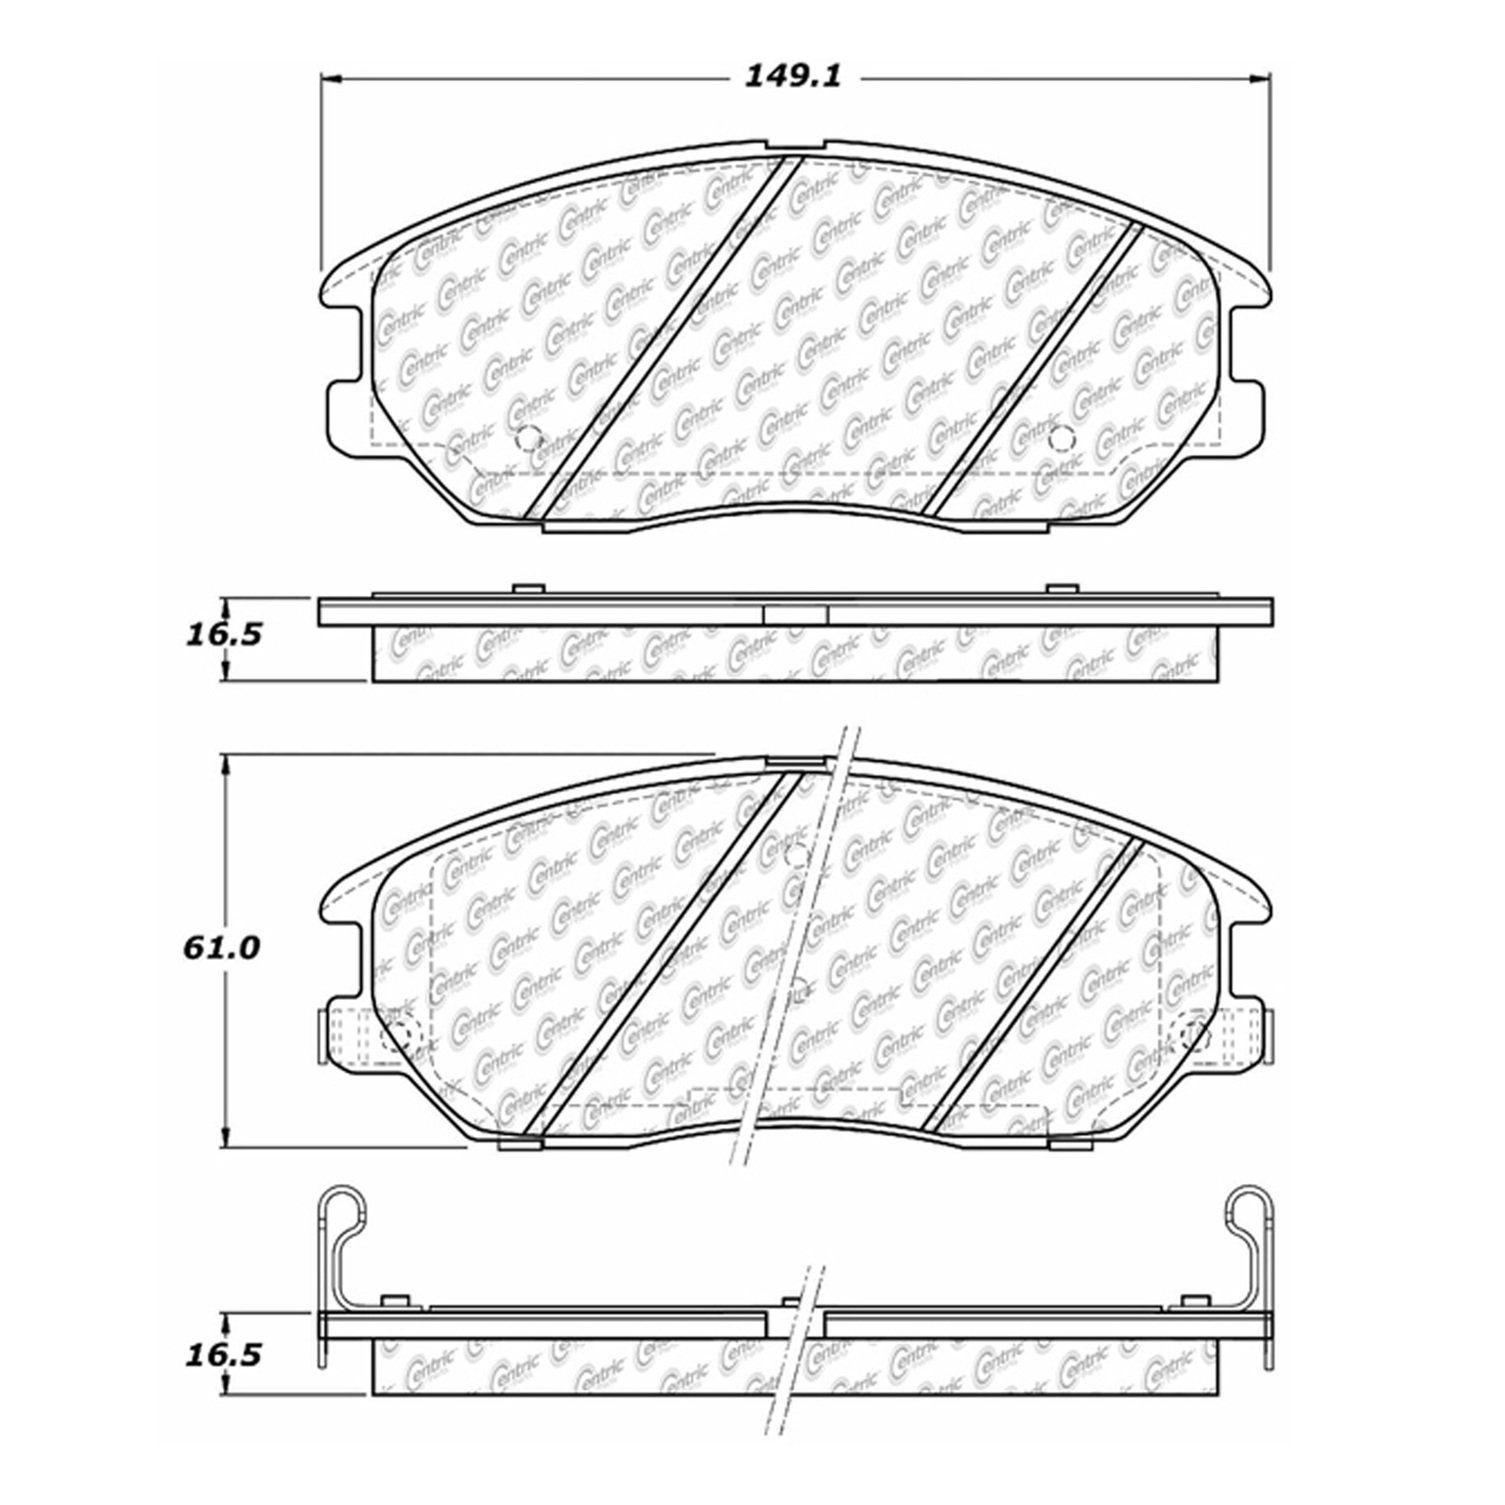 Hyundai Xg350 Disc Brake Pad Replacement Akebono Auto 7 Beck Xg300 Wiring Diagram 2004 Front Centric 10210130